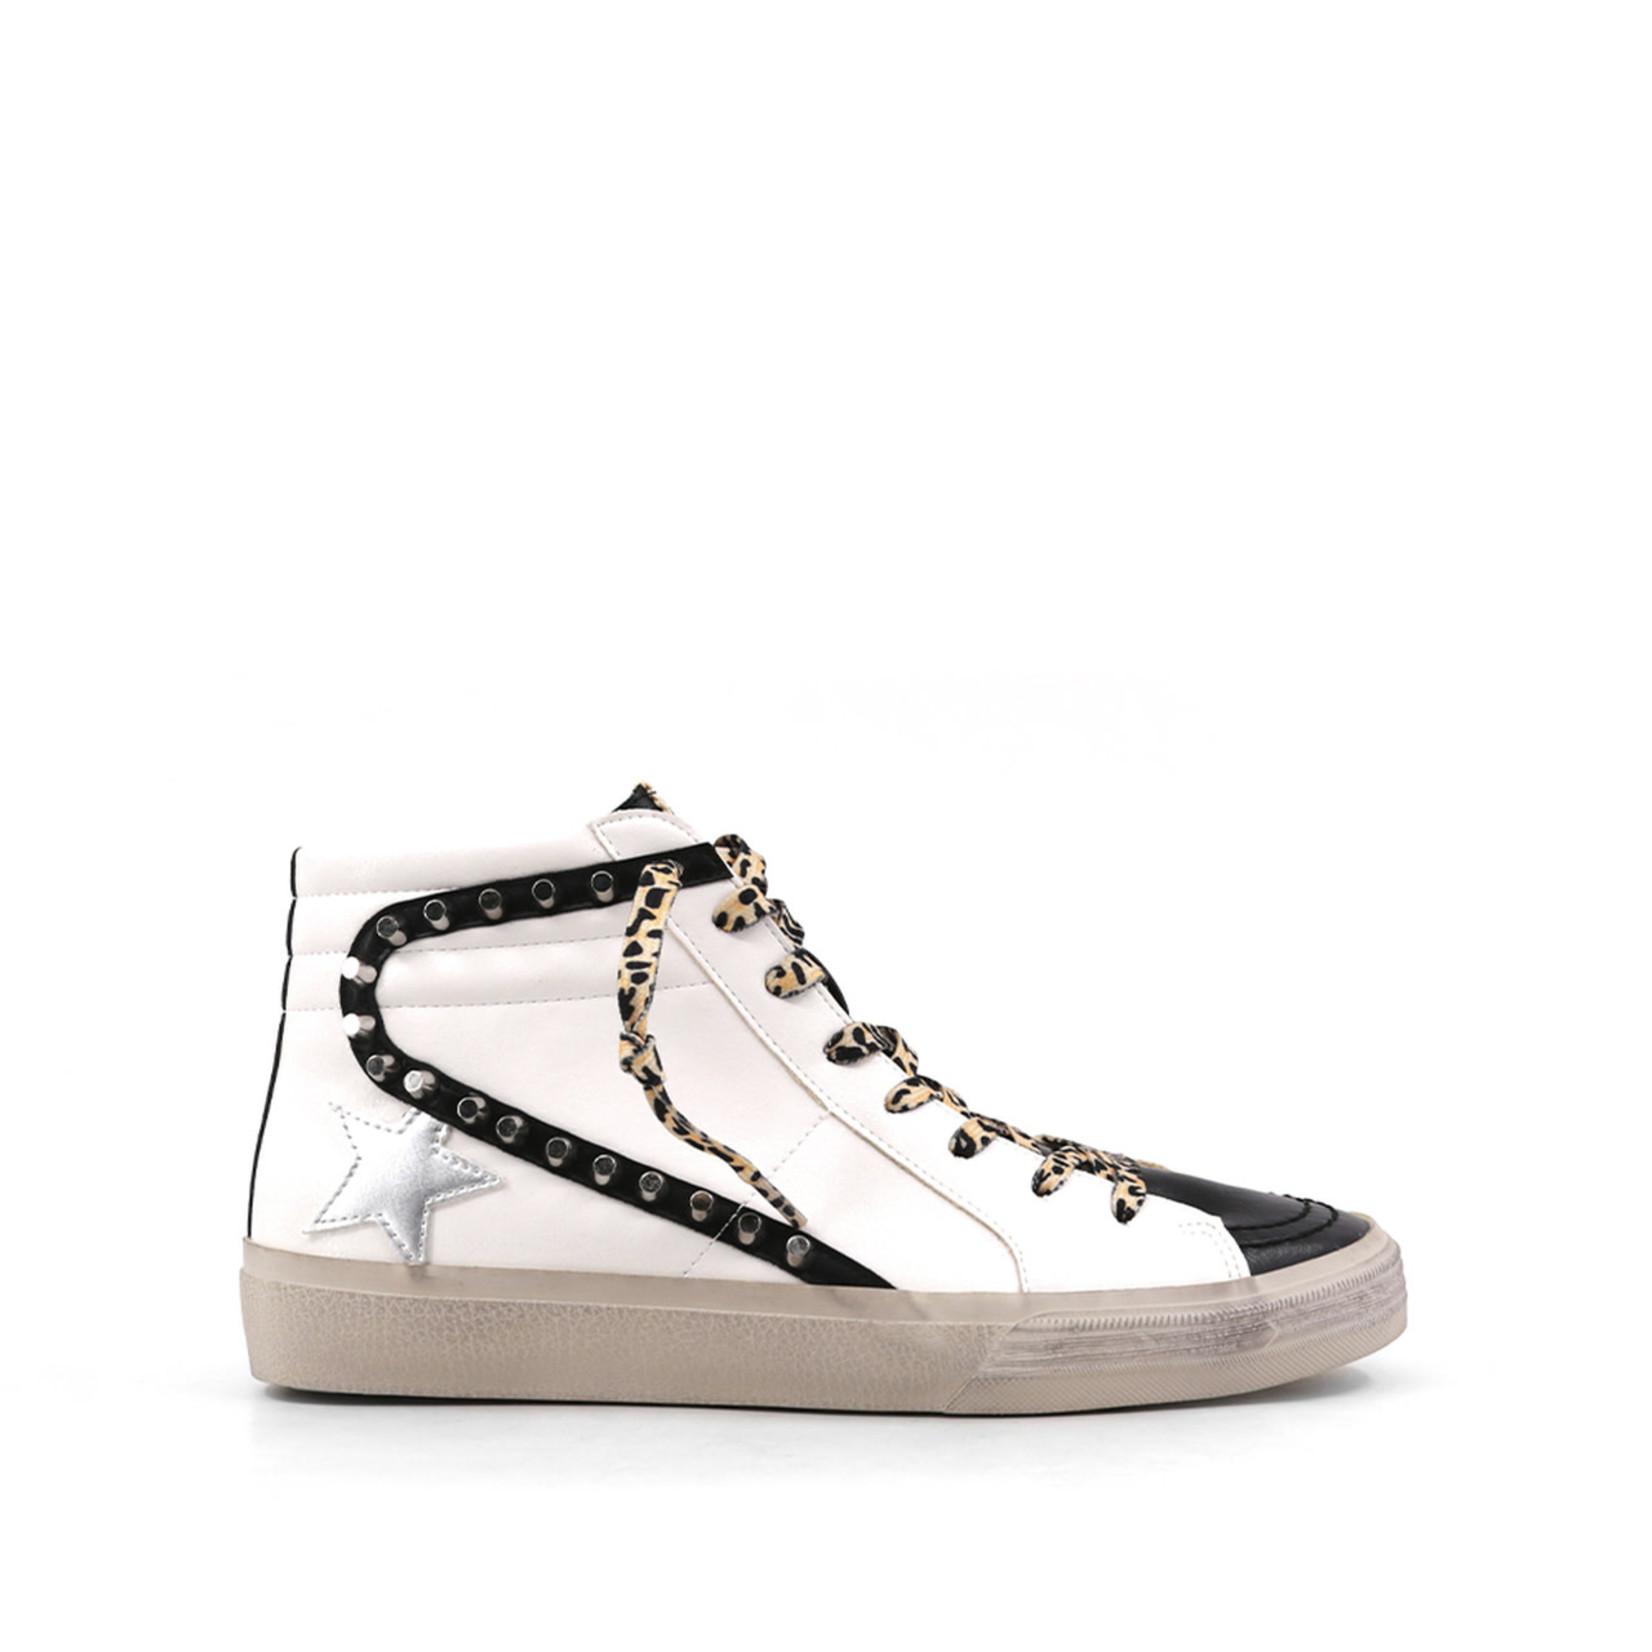 ShuShop Company RiRi Hi-Top Sneaker